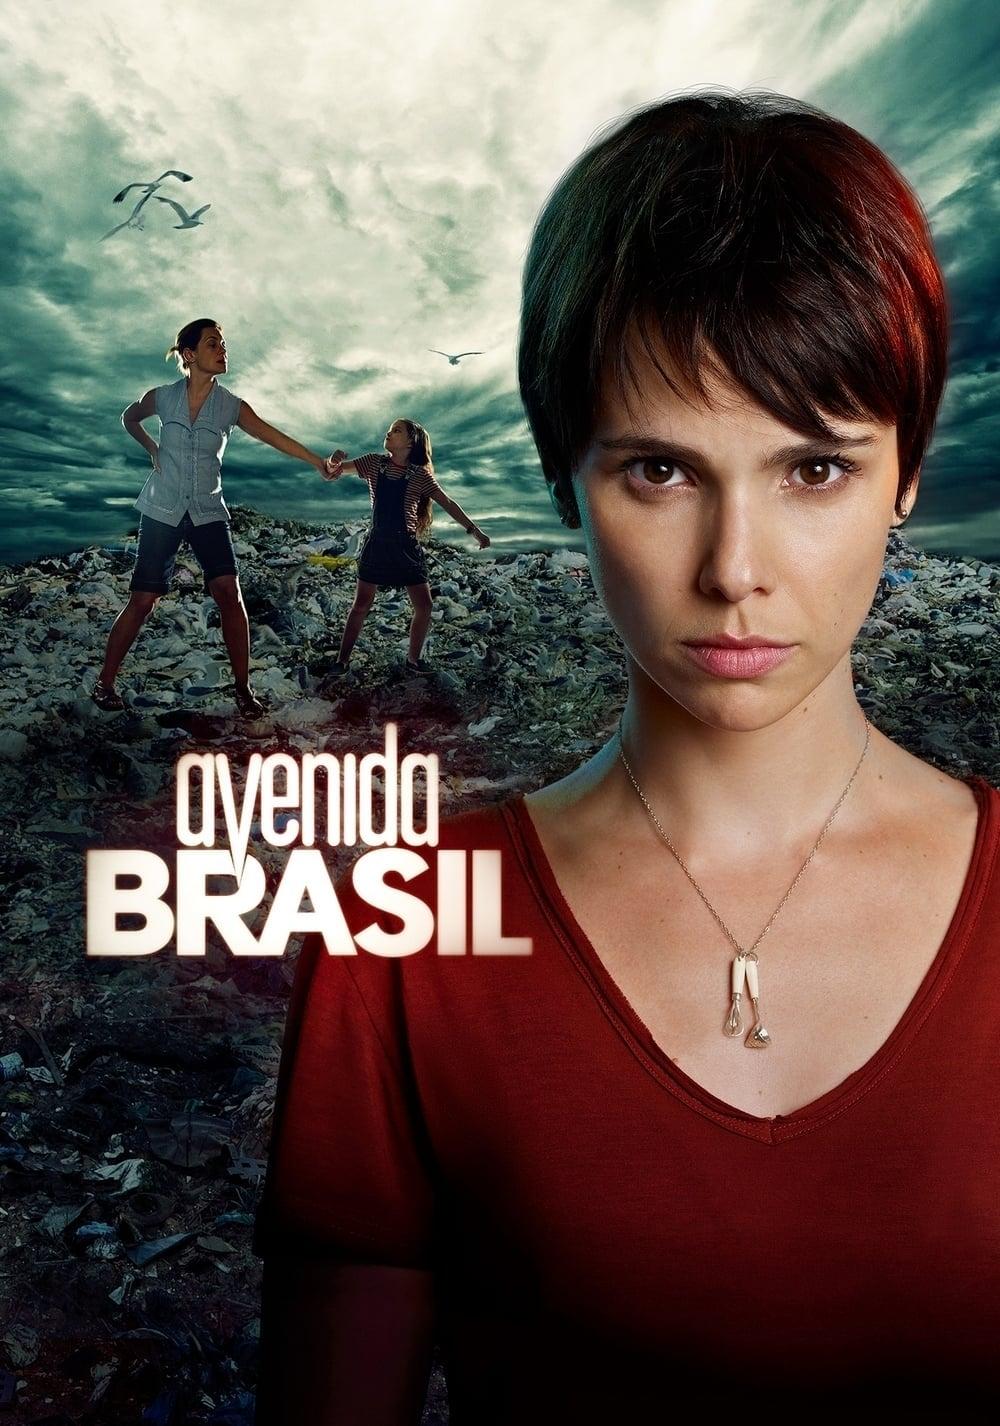 Avenida Brasil TV Shows About Betrayal